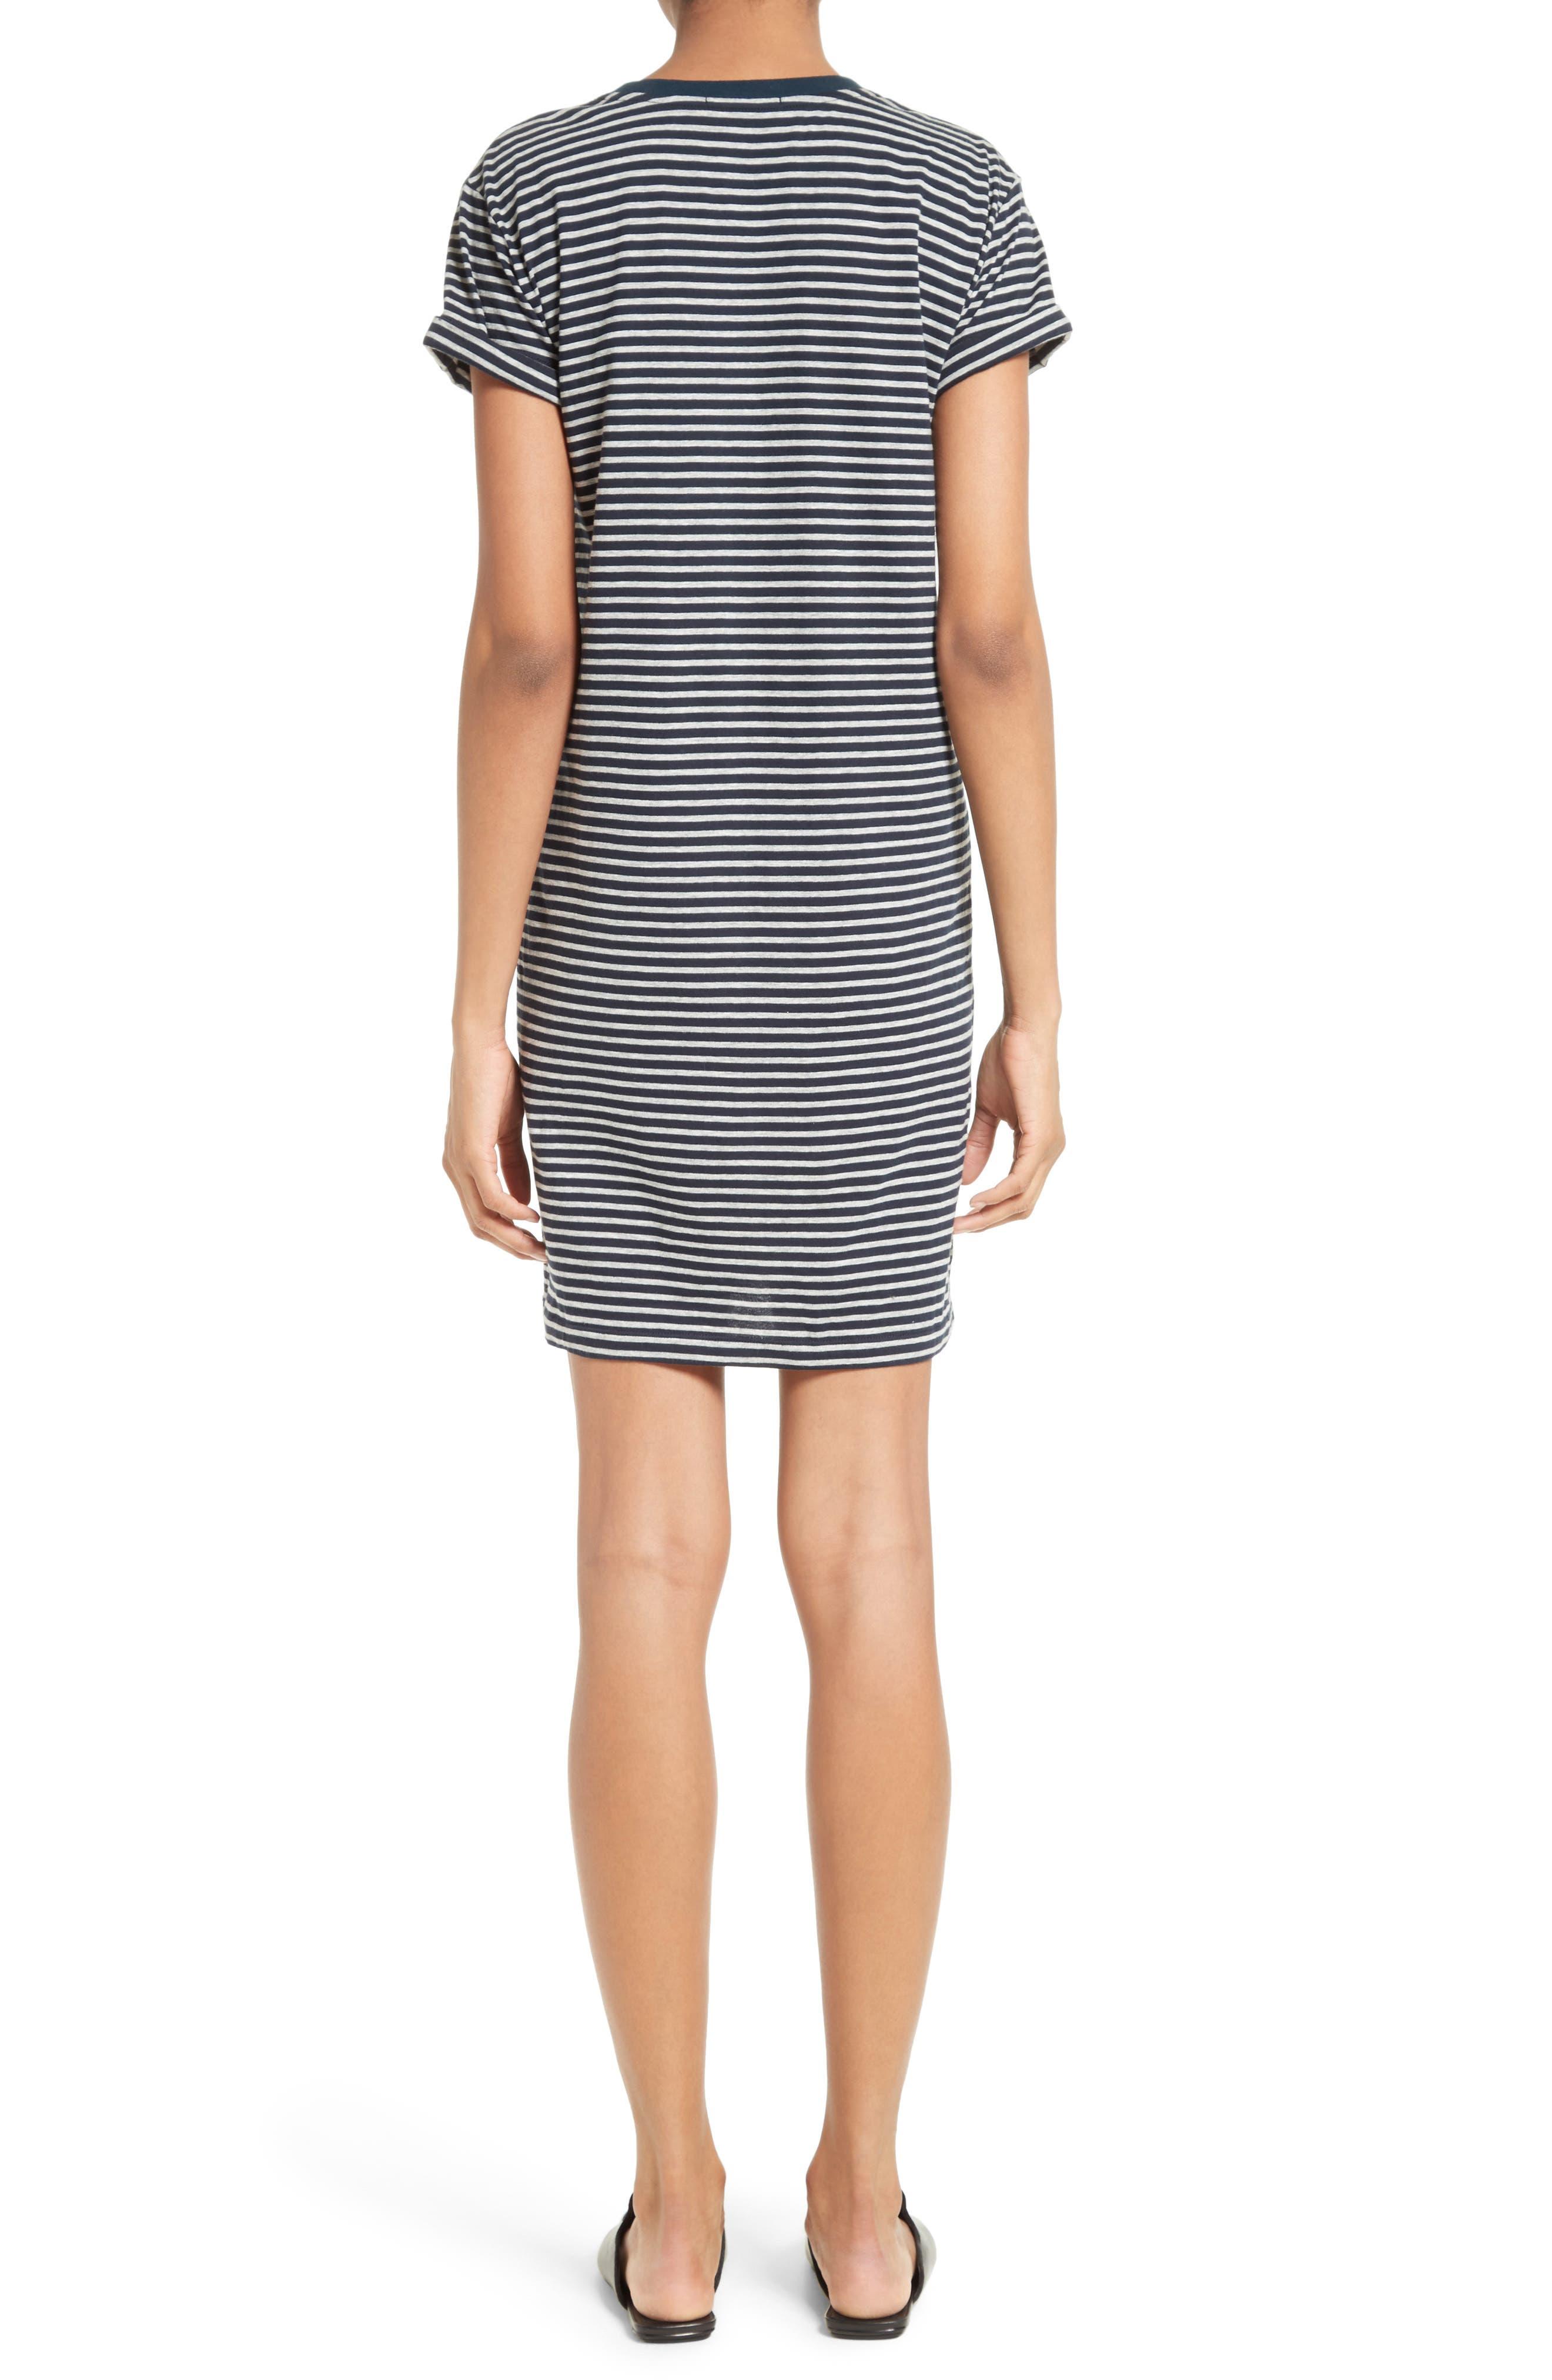 T by Alexander Wang Stripe T-Shirt Dress,                             Alternate thumbnail 2, color,                             400